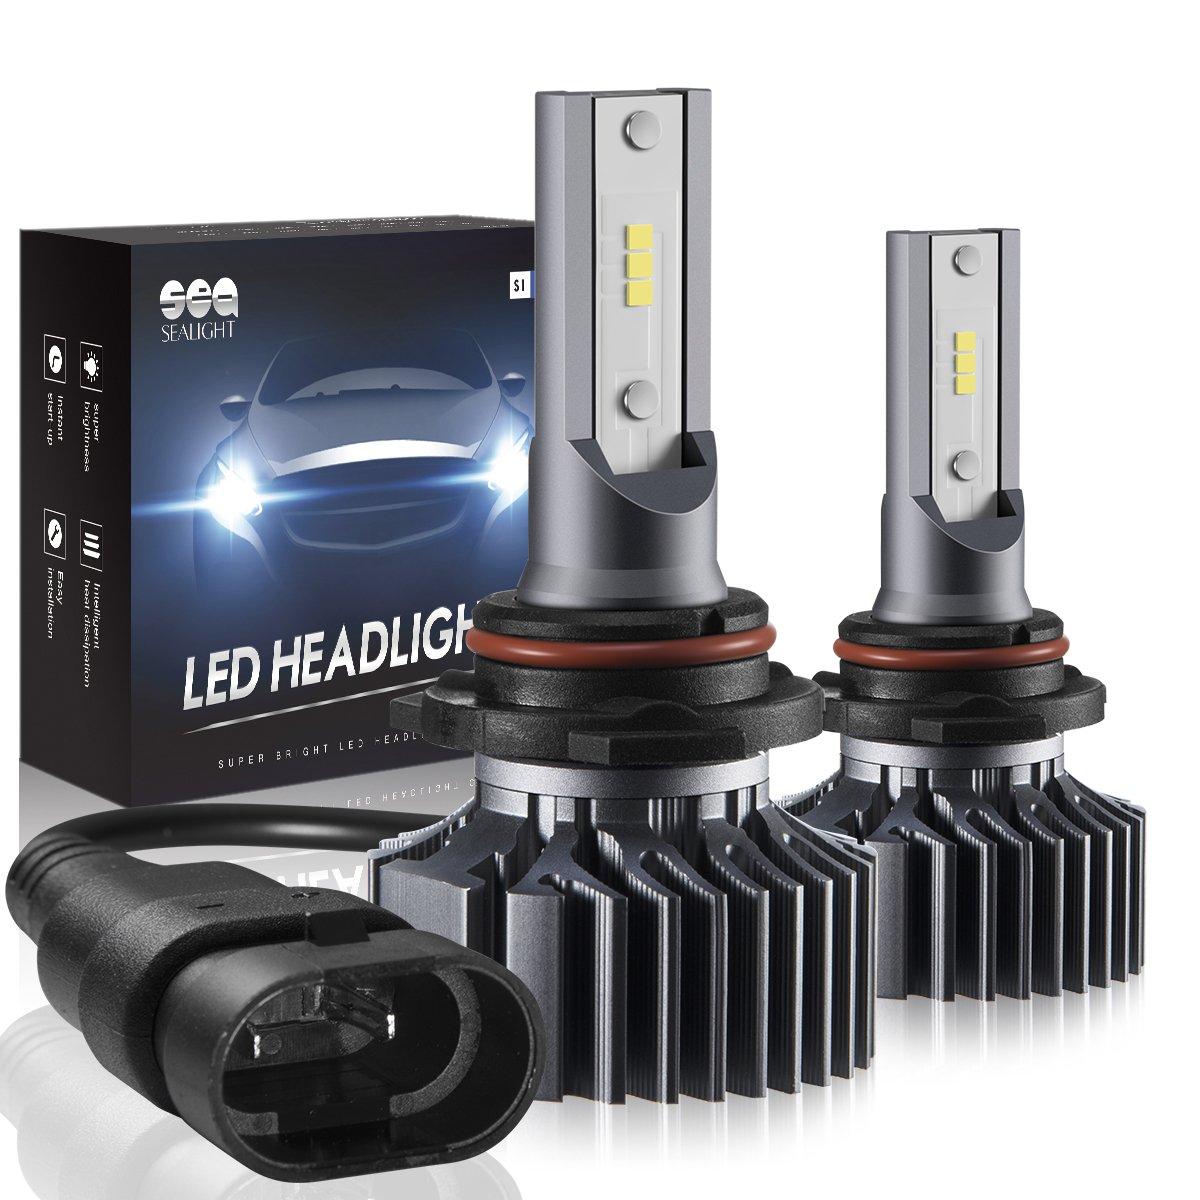 H4/9003/HB2 LED Headlight Bulbs Hi/Lo Beam Conversion Kit, DOT Approved, SEALIGHT S1 series Super Bright 24xCSP chips LED Automotive Headlamp-6000K Xenon White (2 Pack) H4/9003 Hi/Lo